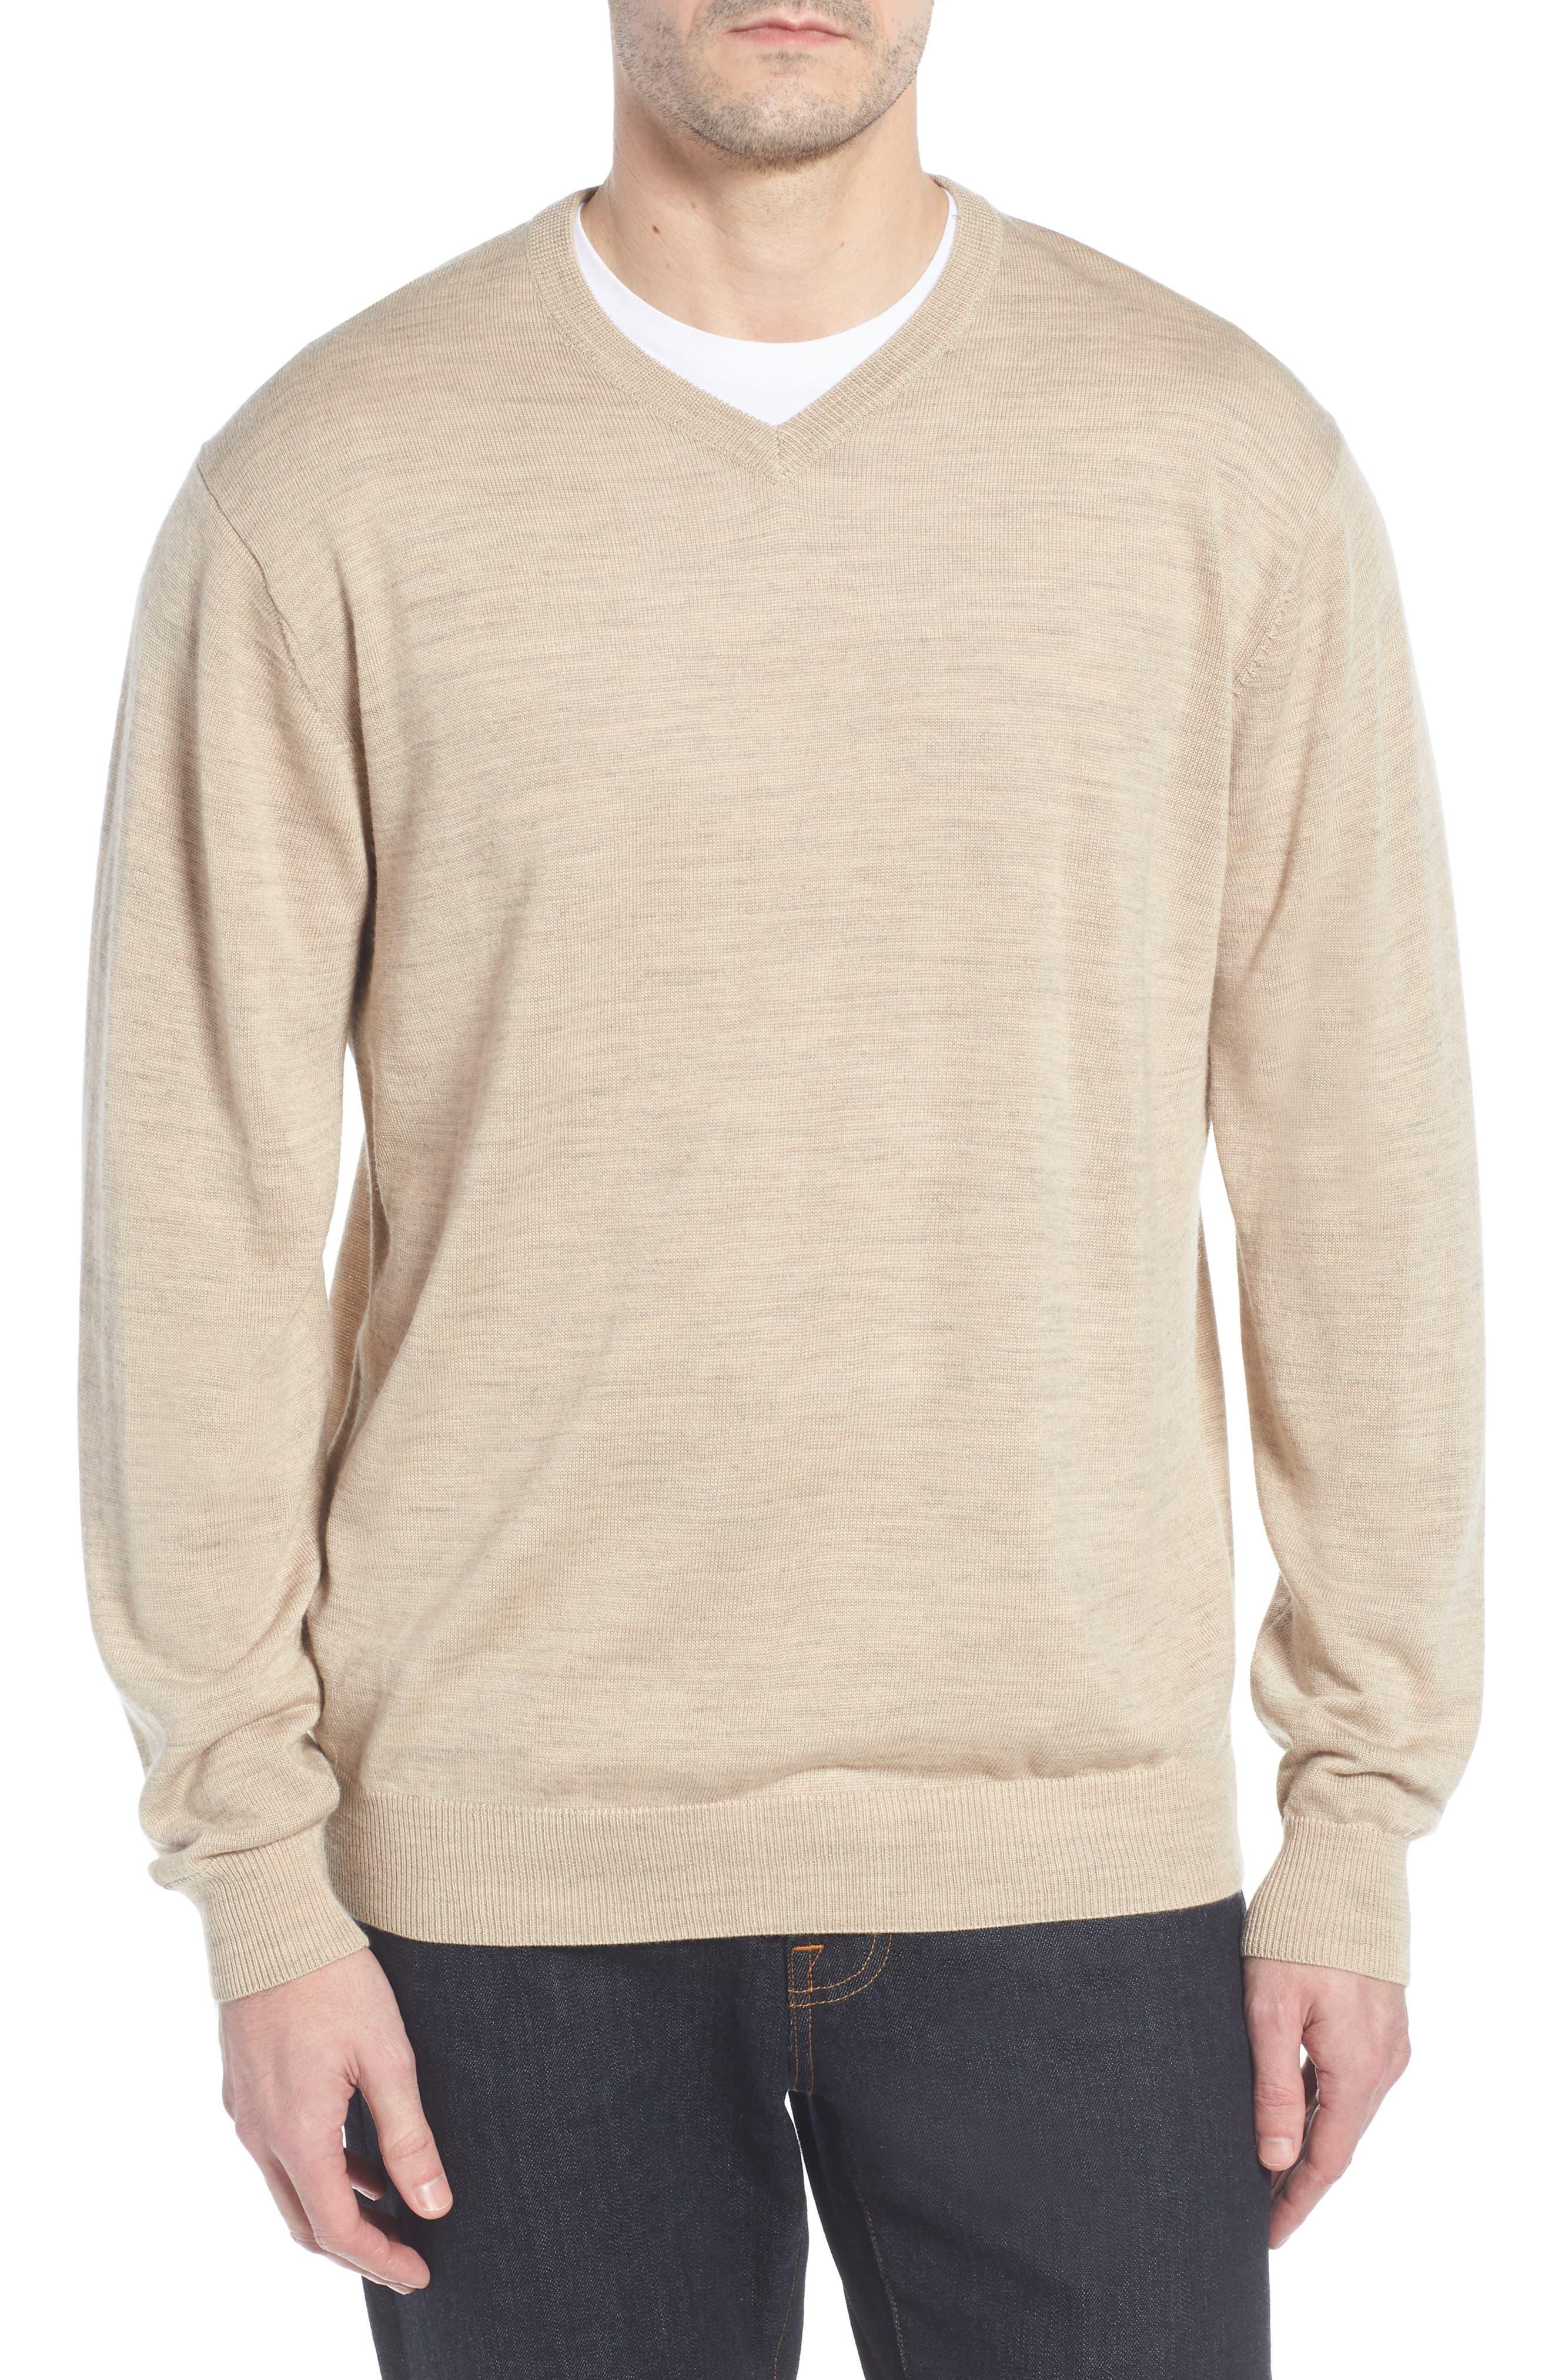 CUTTER & BUCK, 'Douglas' Merino Wool Blend V-Neck Sweater, Main thumbnail 1, color, SAND HEATHER